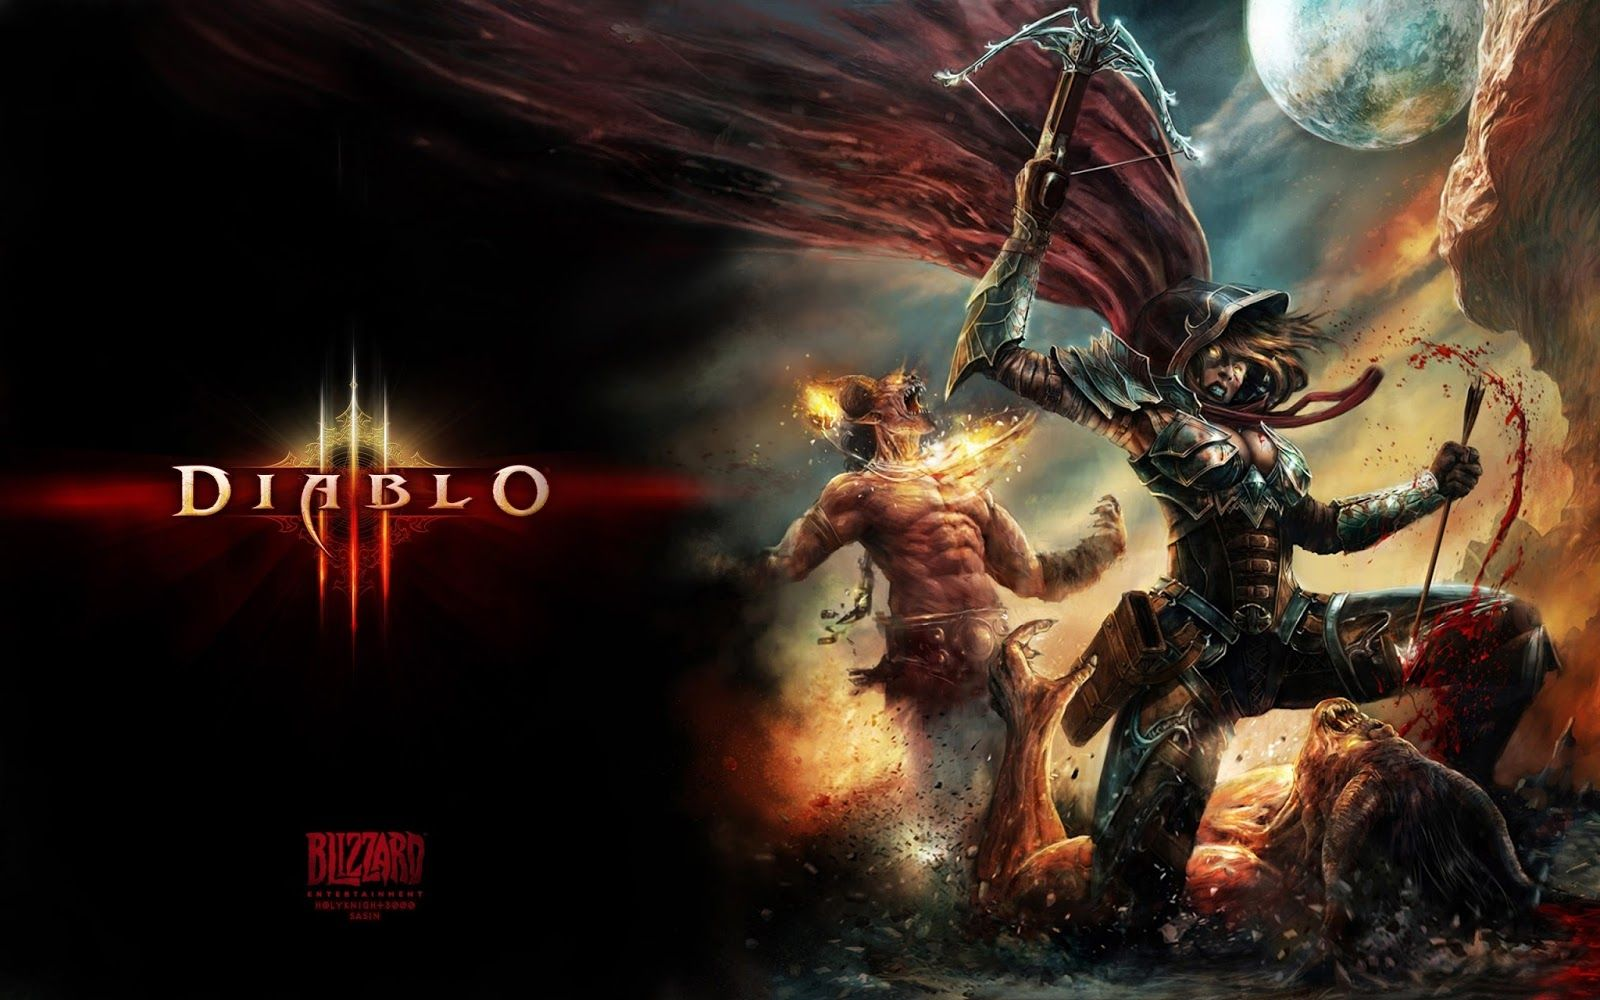 Diablo 3 Wallpaper Demon Hunter Diablo 3 Star Wars Images Diablo